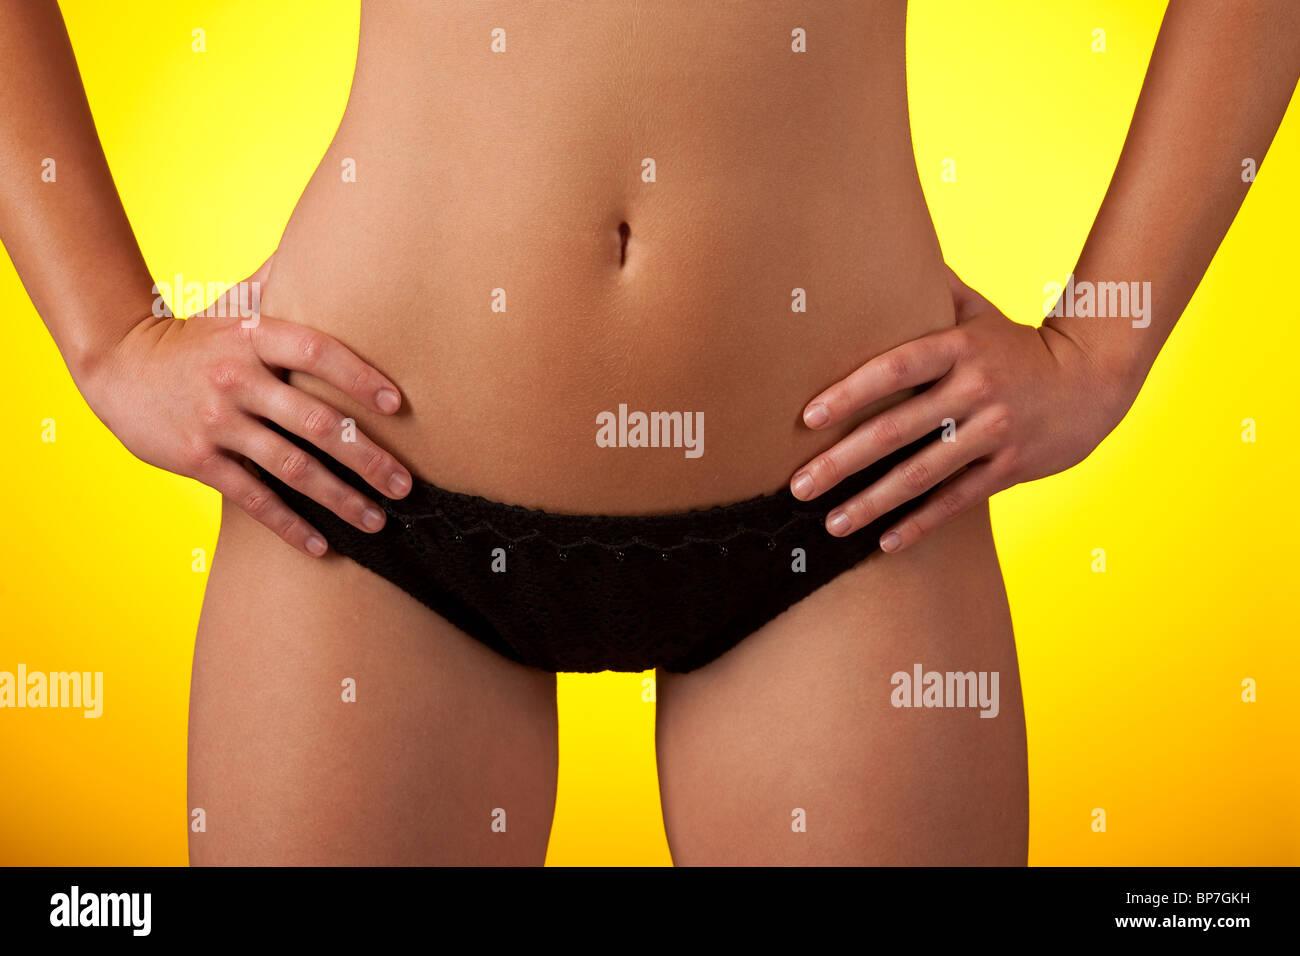 Part of female body wearing black bikini on yellow background - Stock Image